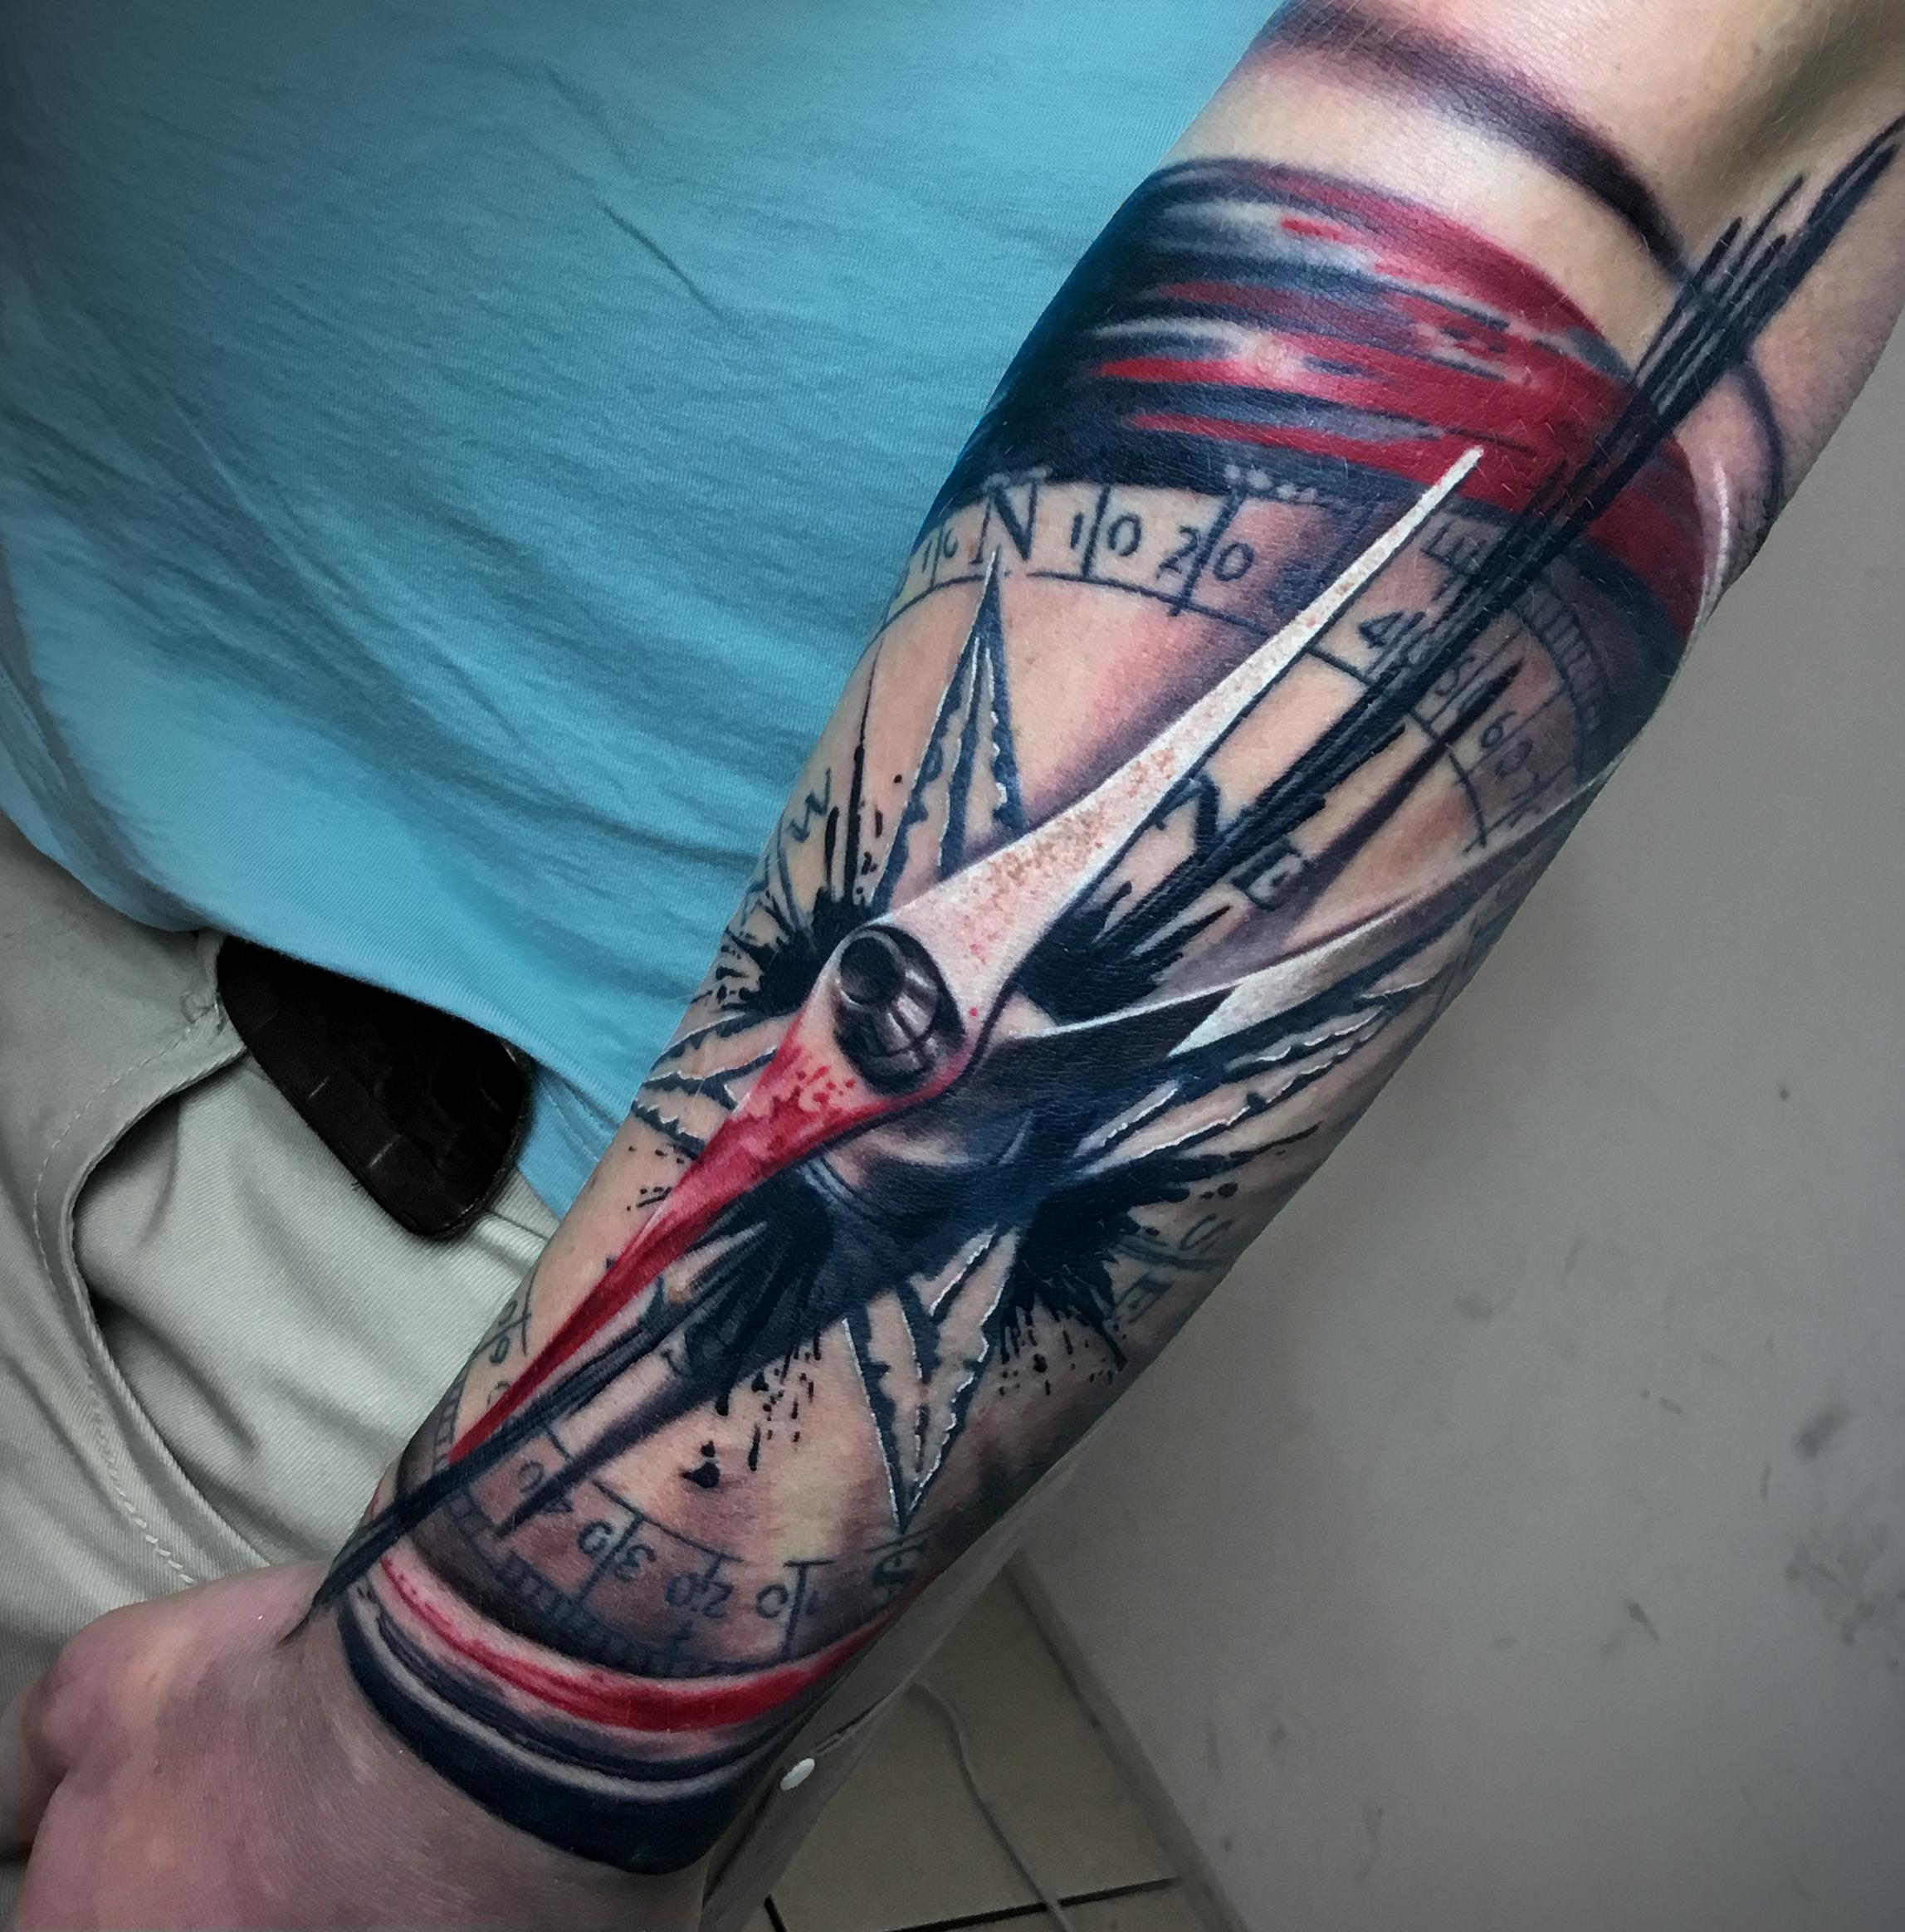 tattoo 6377 Biro Blanka tetovalo tattooist tattoo artist taetowierer selfmade berlin selfmadeberlin realistic realistisch details detailliert kompass compass trashpolka berlintattoo - Trash Polka Tattoo Artists